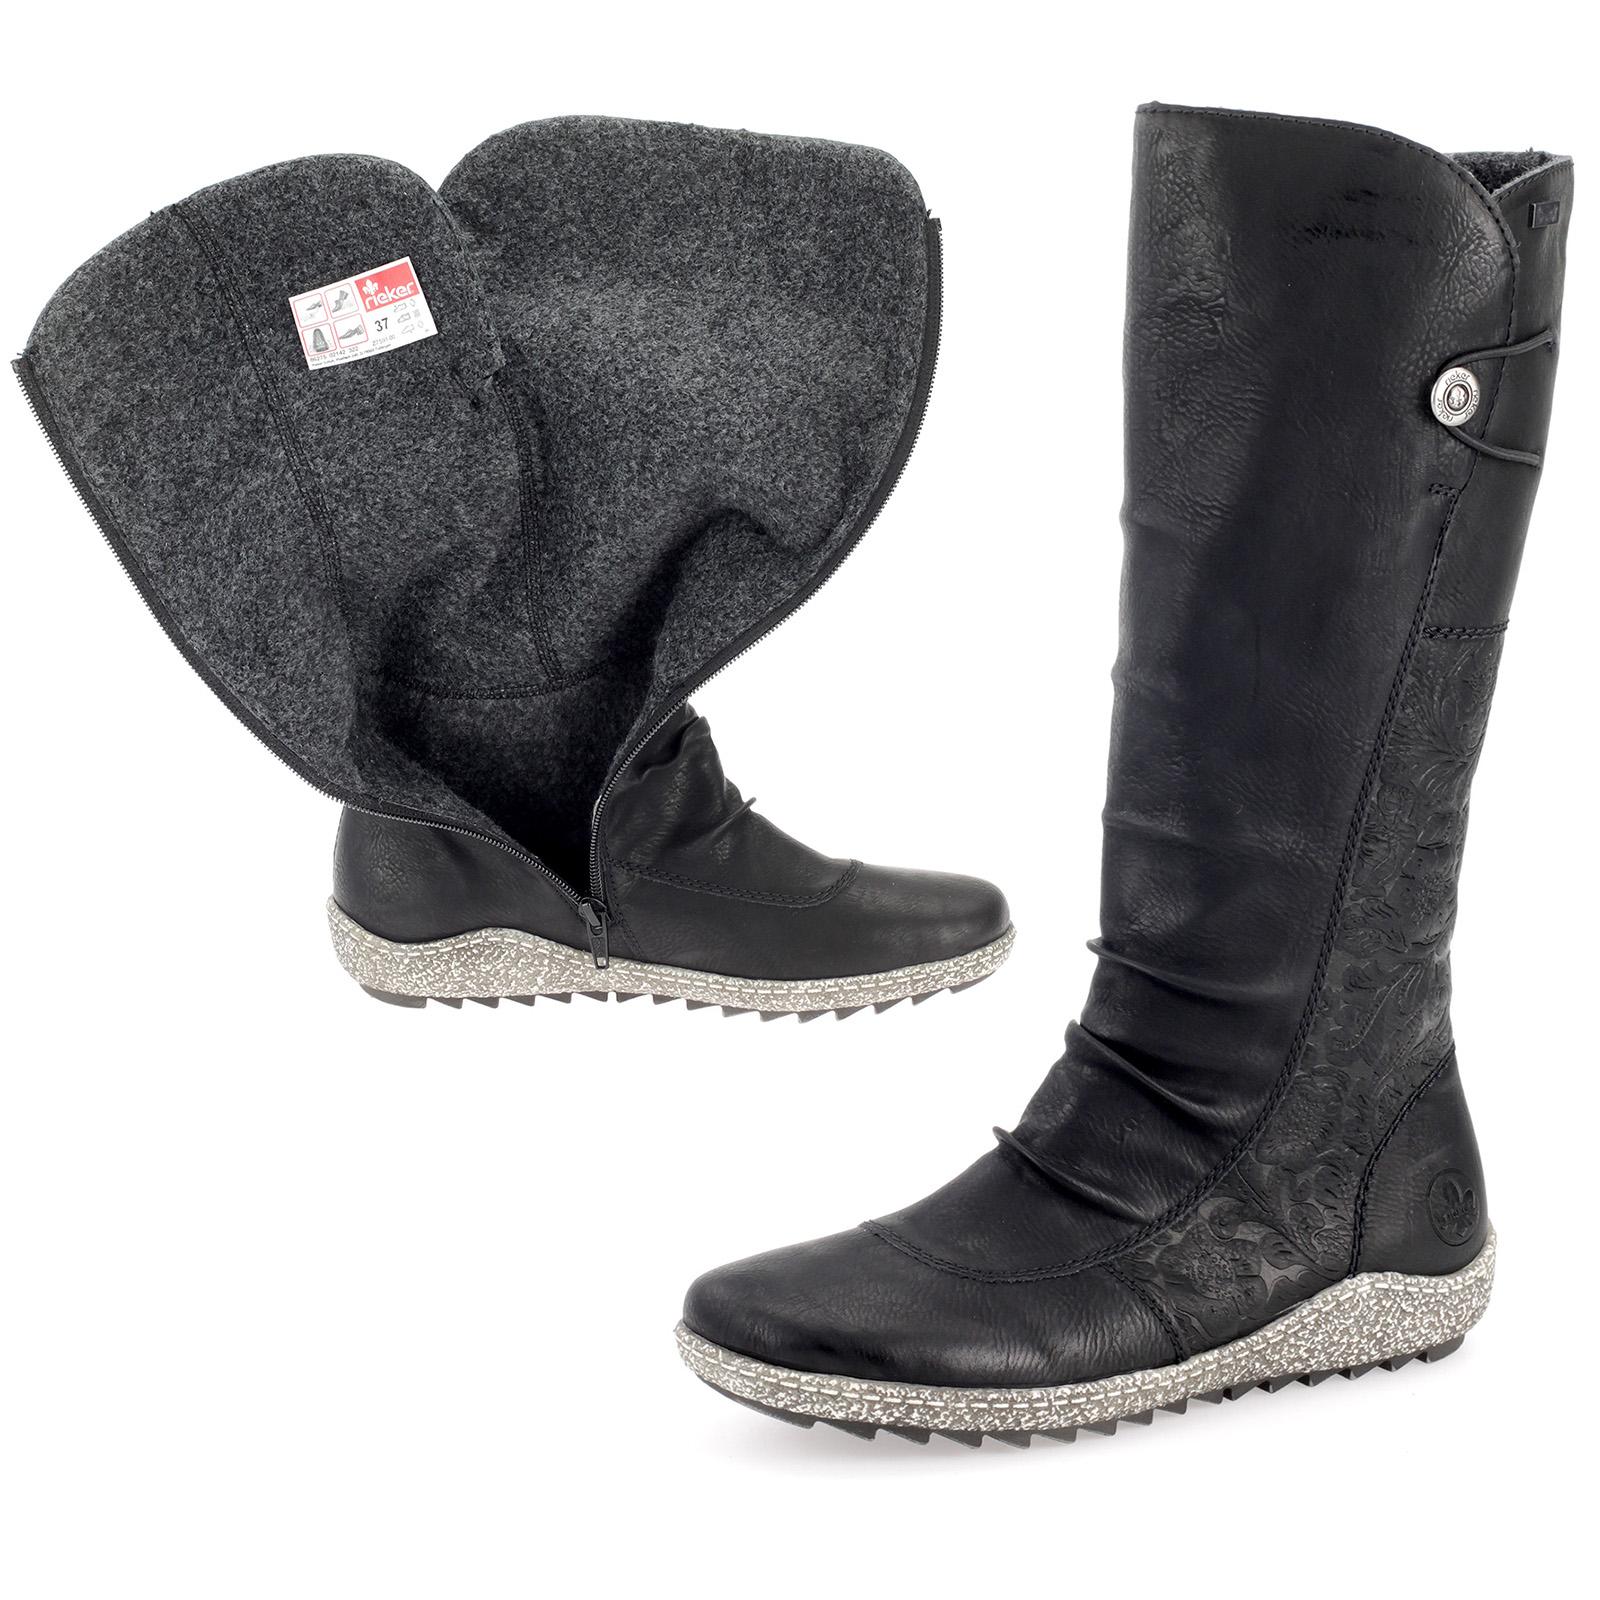 Rieker TEX Damenschuhe Stiefel Gefüfutterte Schuhe Boot Schwarz Z7591-00